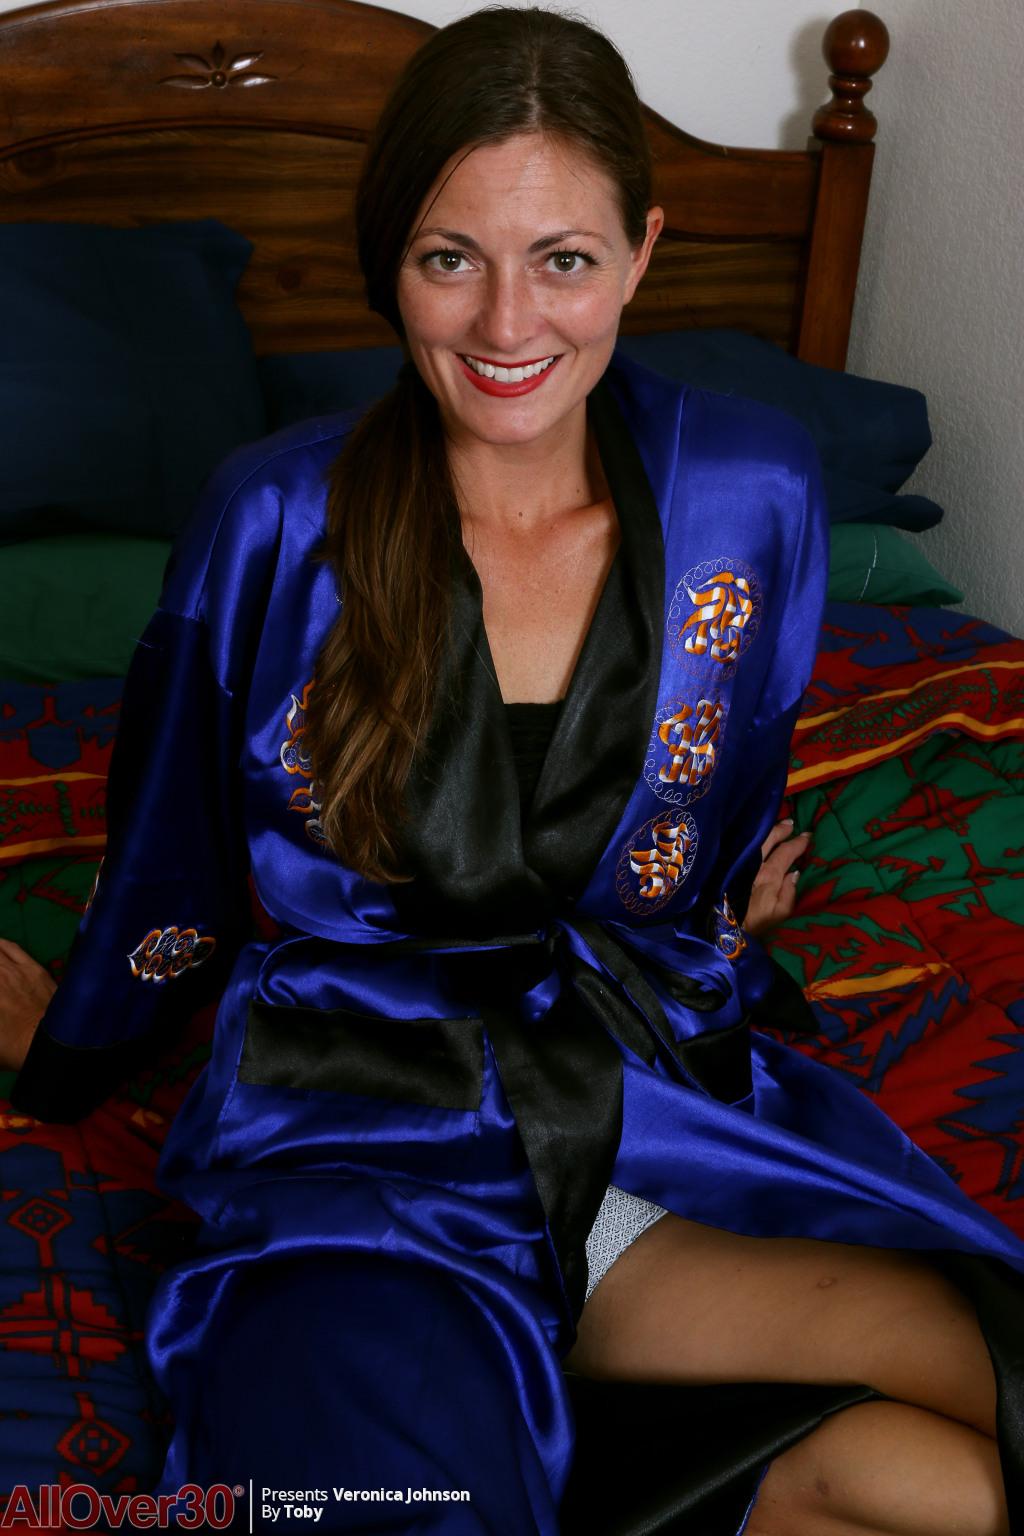 Veronica Johnson from AllOver30